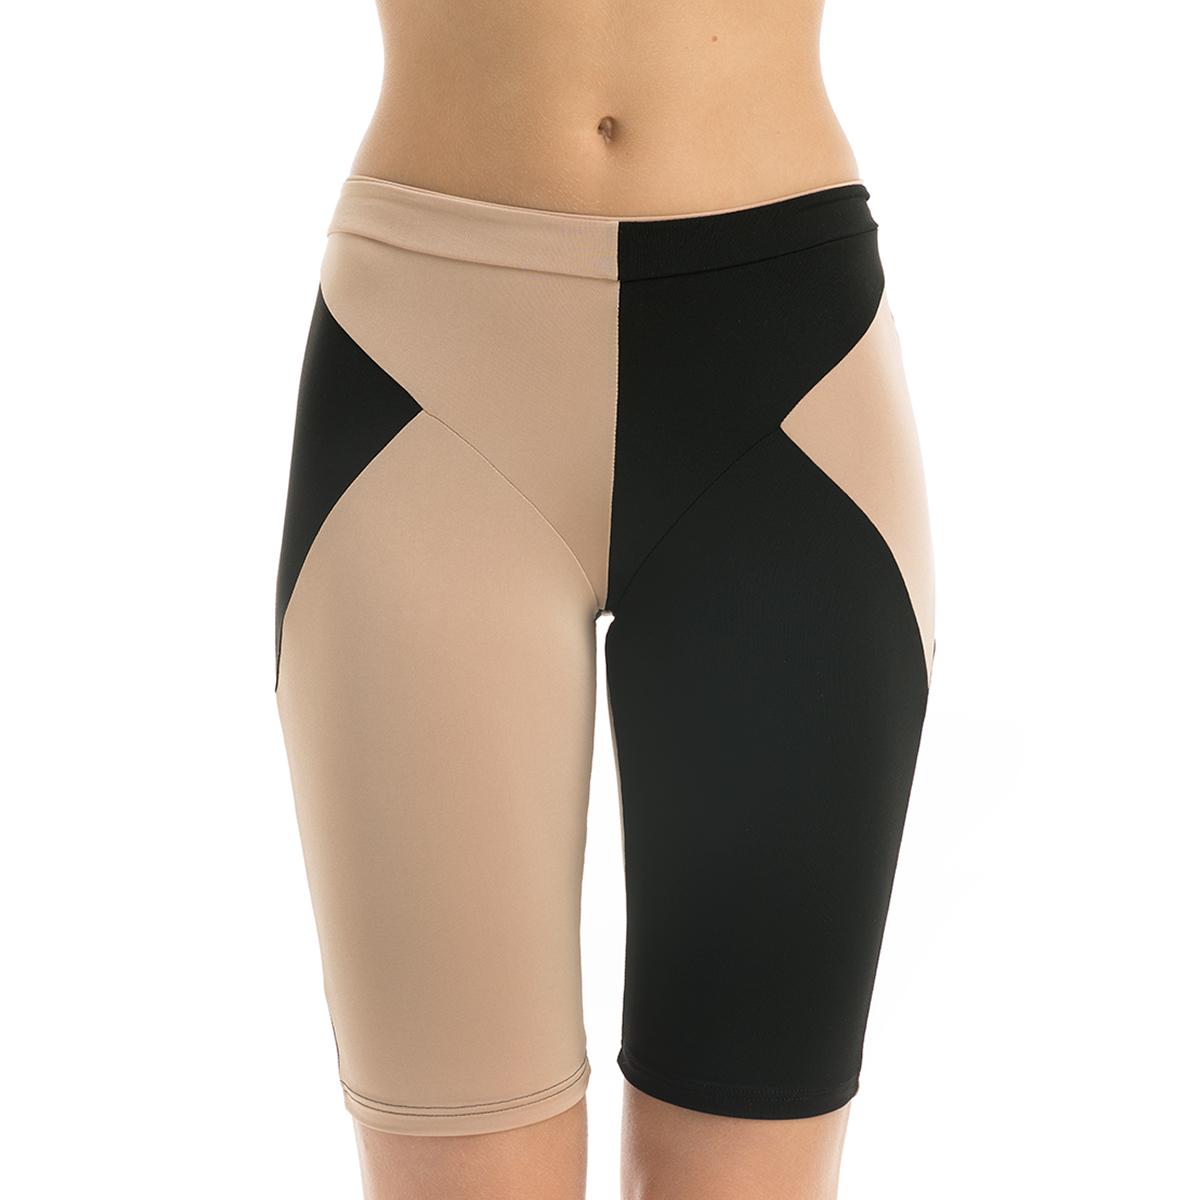 movement-biker-shorts-black-nude01-front.jpg